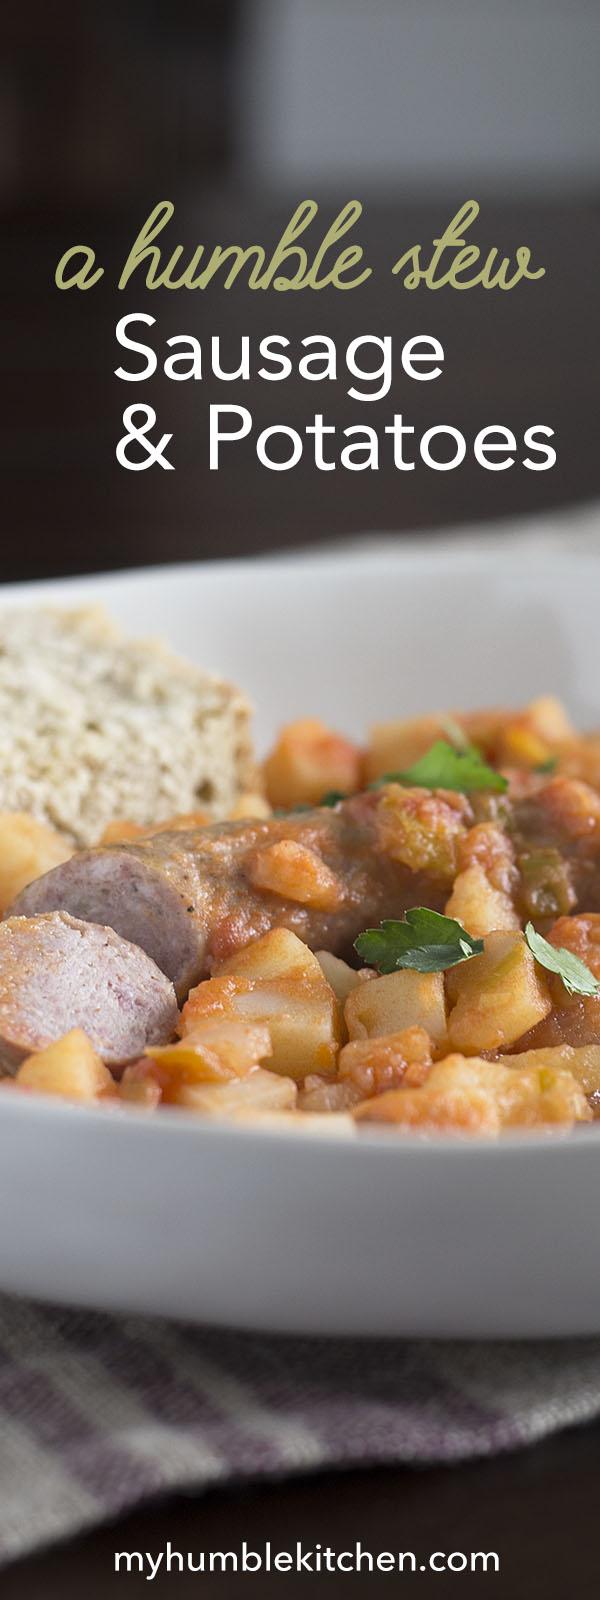 Sausage and Potatoes, A Humble Stew | myhumblekitchen.com